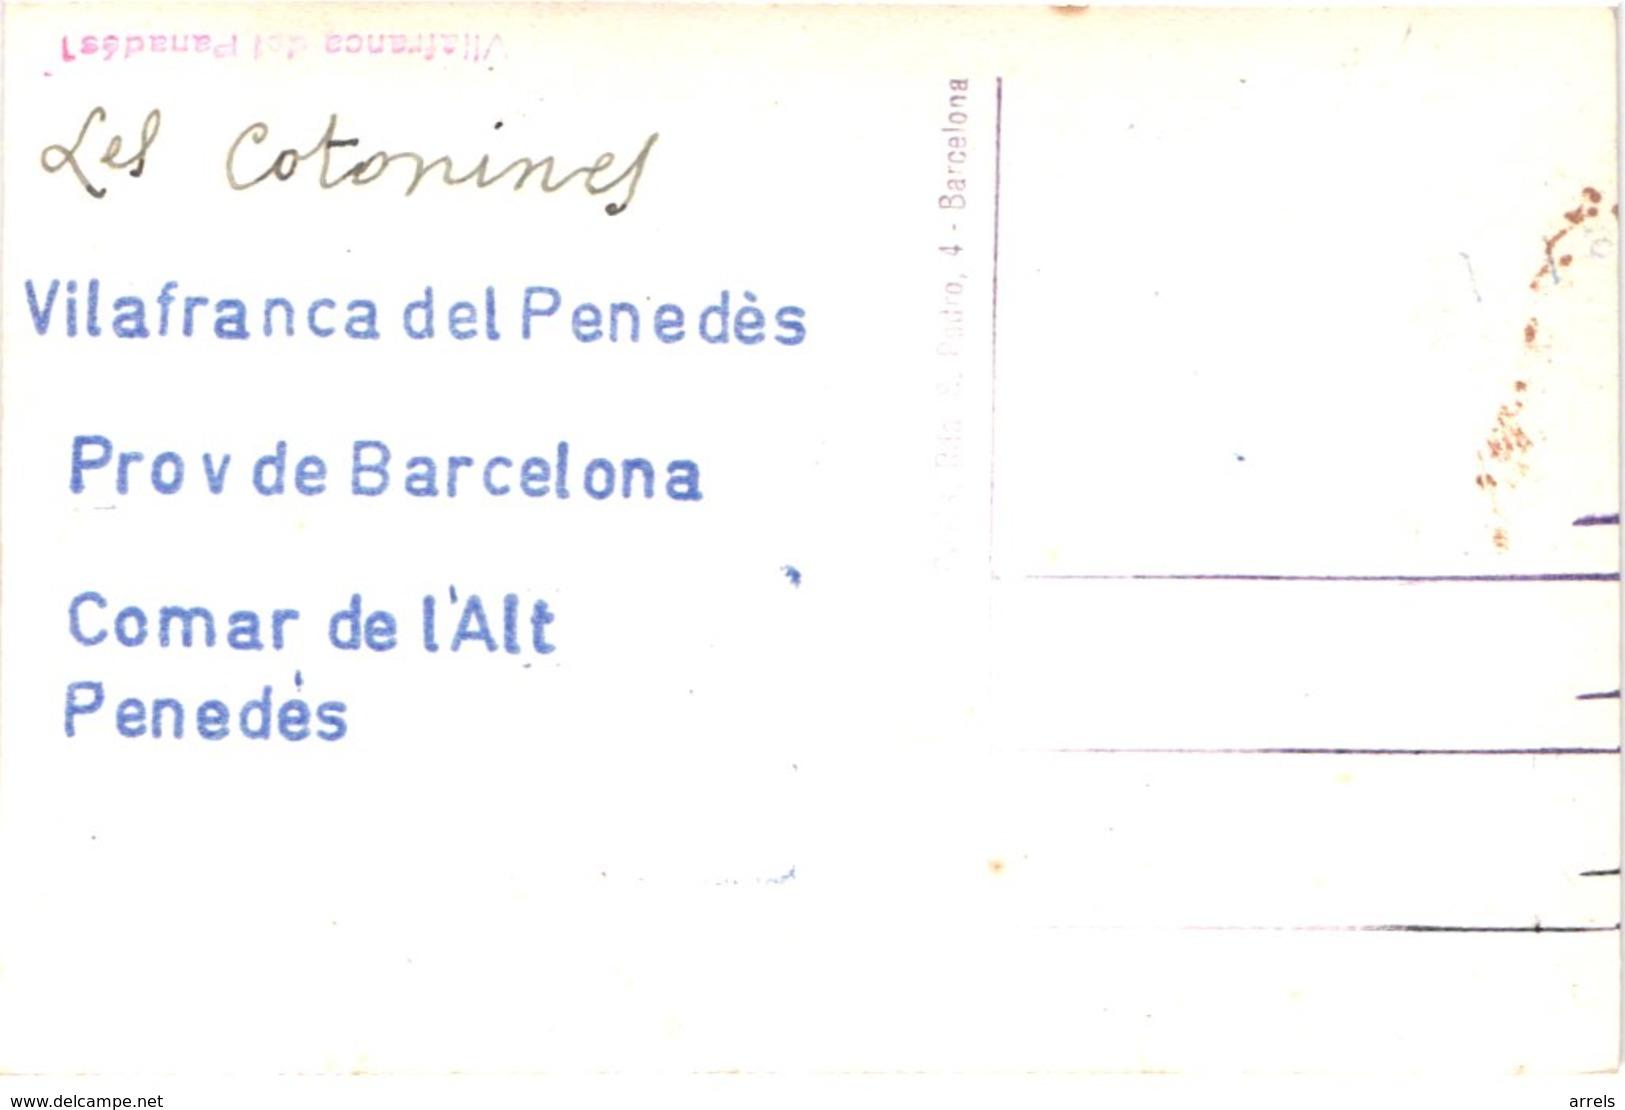 ES VILAFRANCA DE PENEDES - Carte Photo - Baile De Los Caballitos - Cavallets - Cavaliers - Geants - Animée - Belle - Barcelona